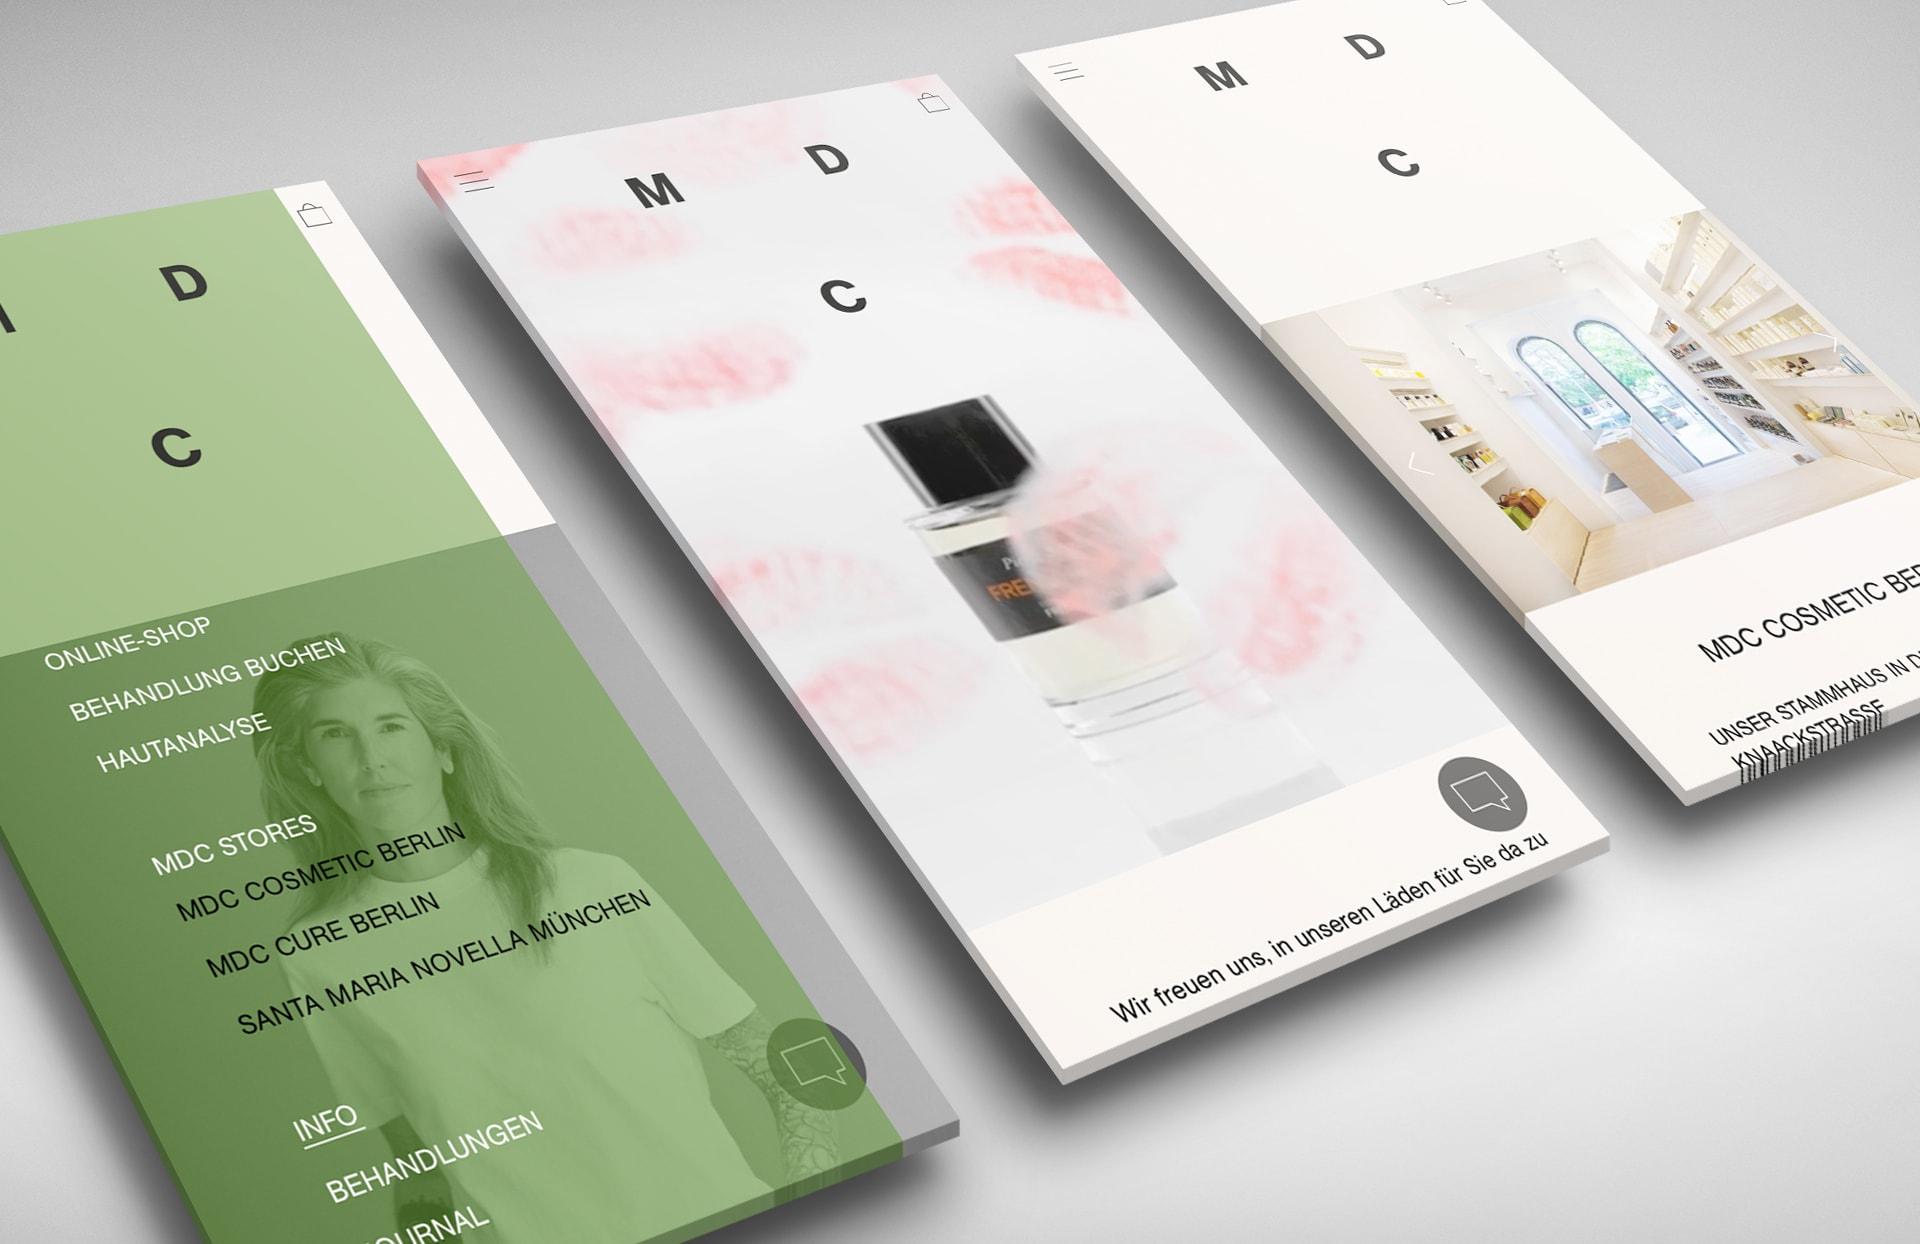 'referenz-mdc-cosmetic-berlin-responsive-webdesign-phone